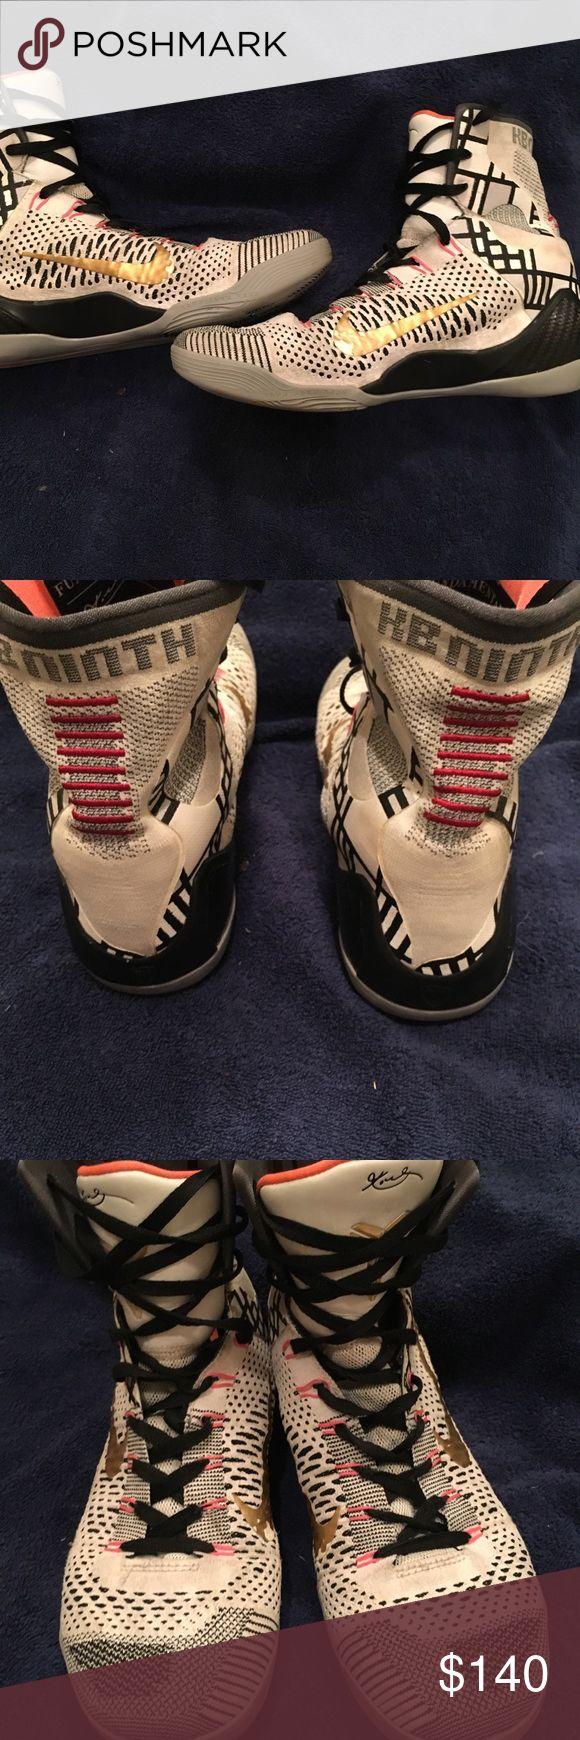 "Kobe 9 elite ""Fundamentals"" Kobe 9 fundamentals size 10.5 Nike Shoes Sneakers"